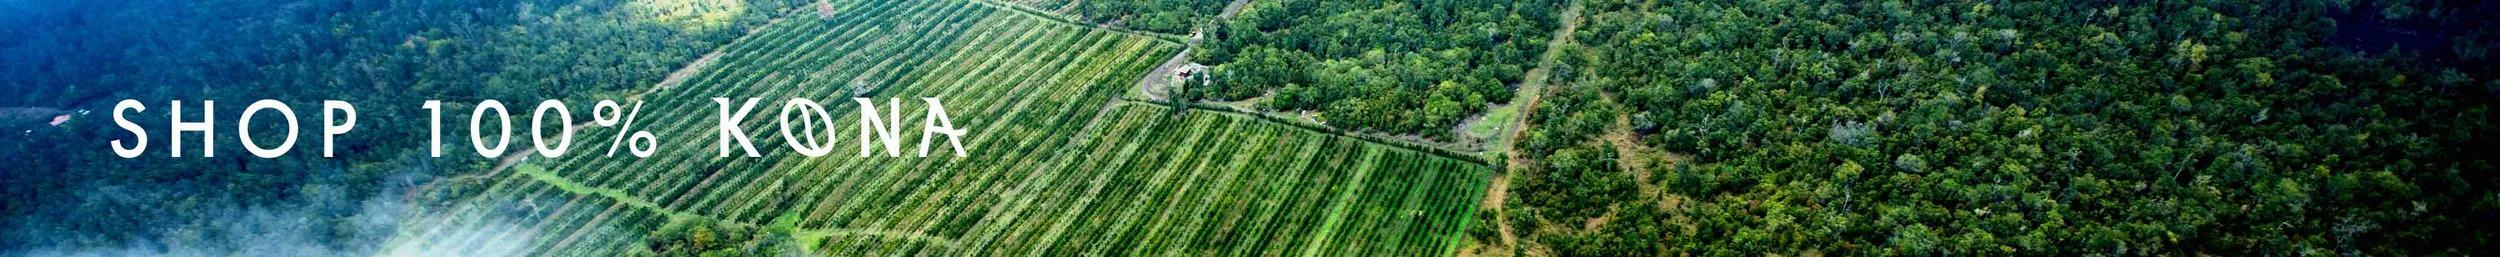 100 percent KONA over farm aireal.jpg